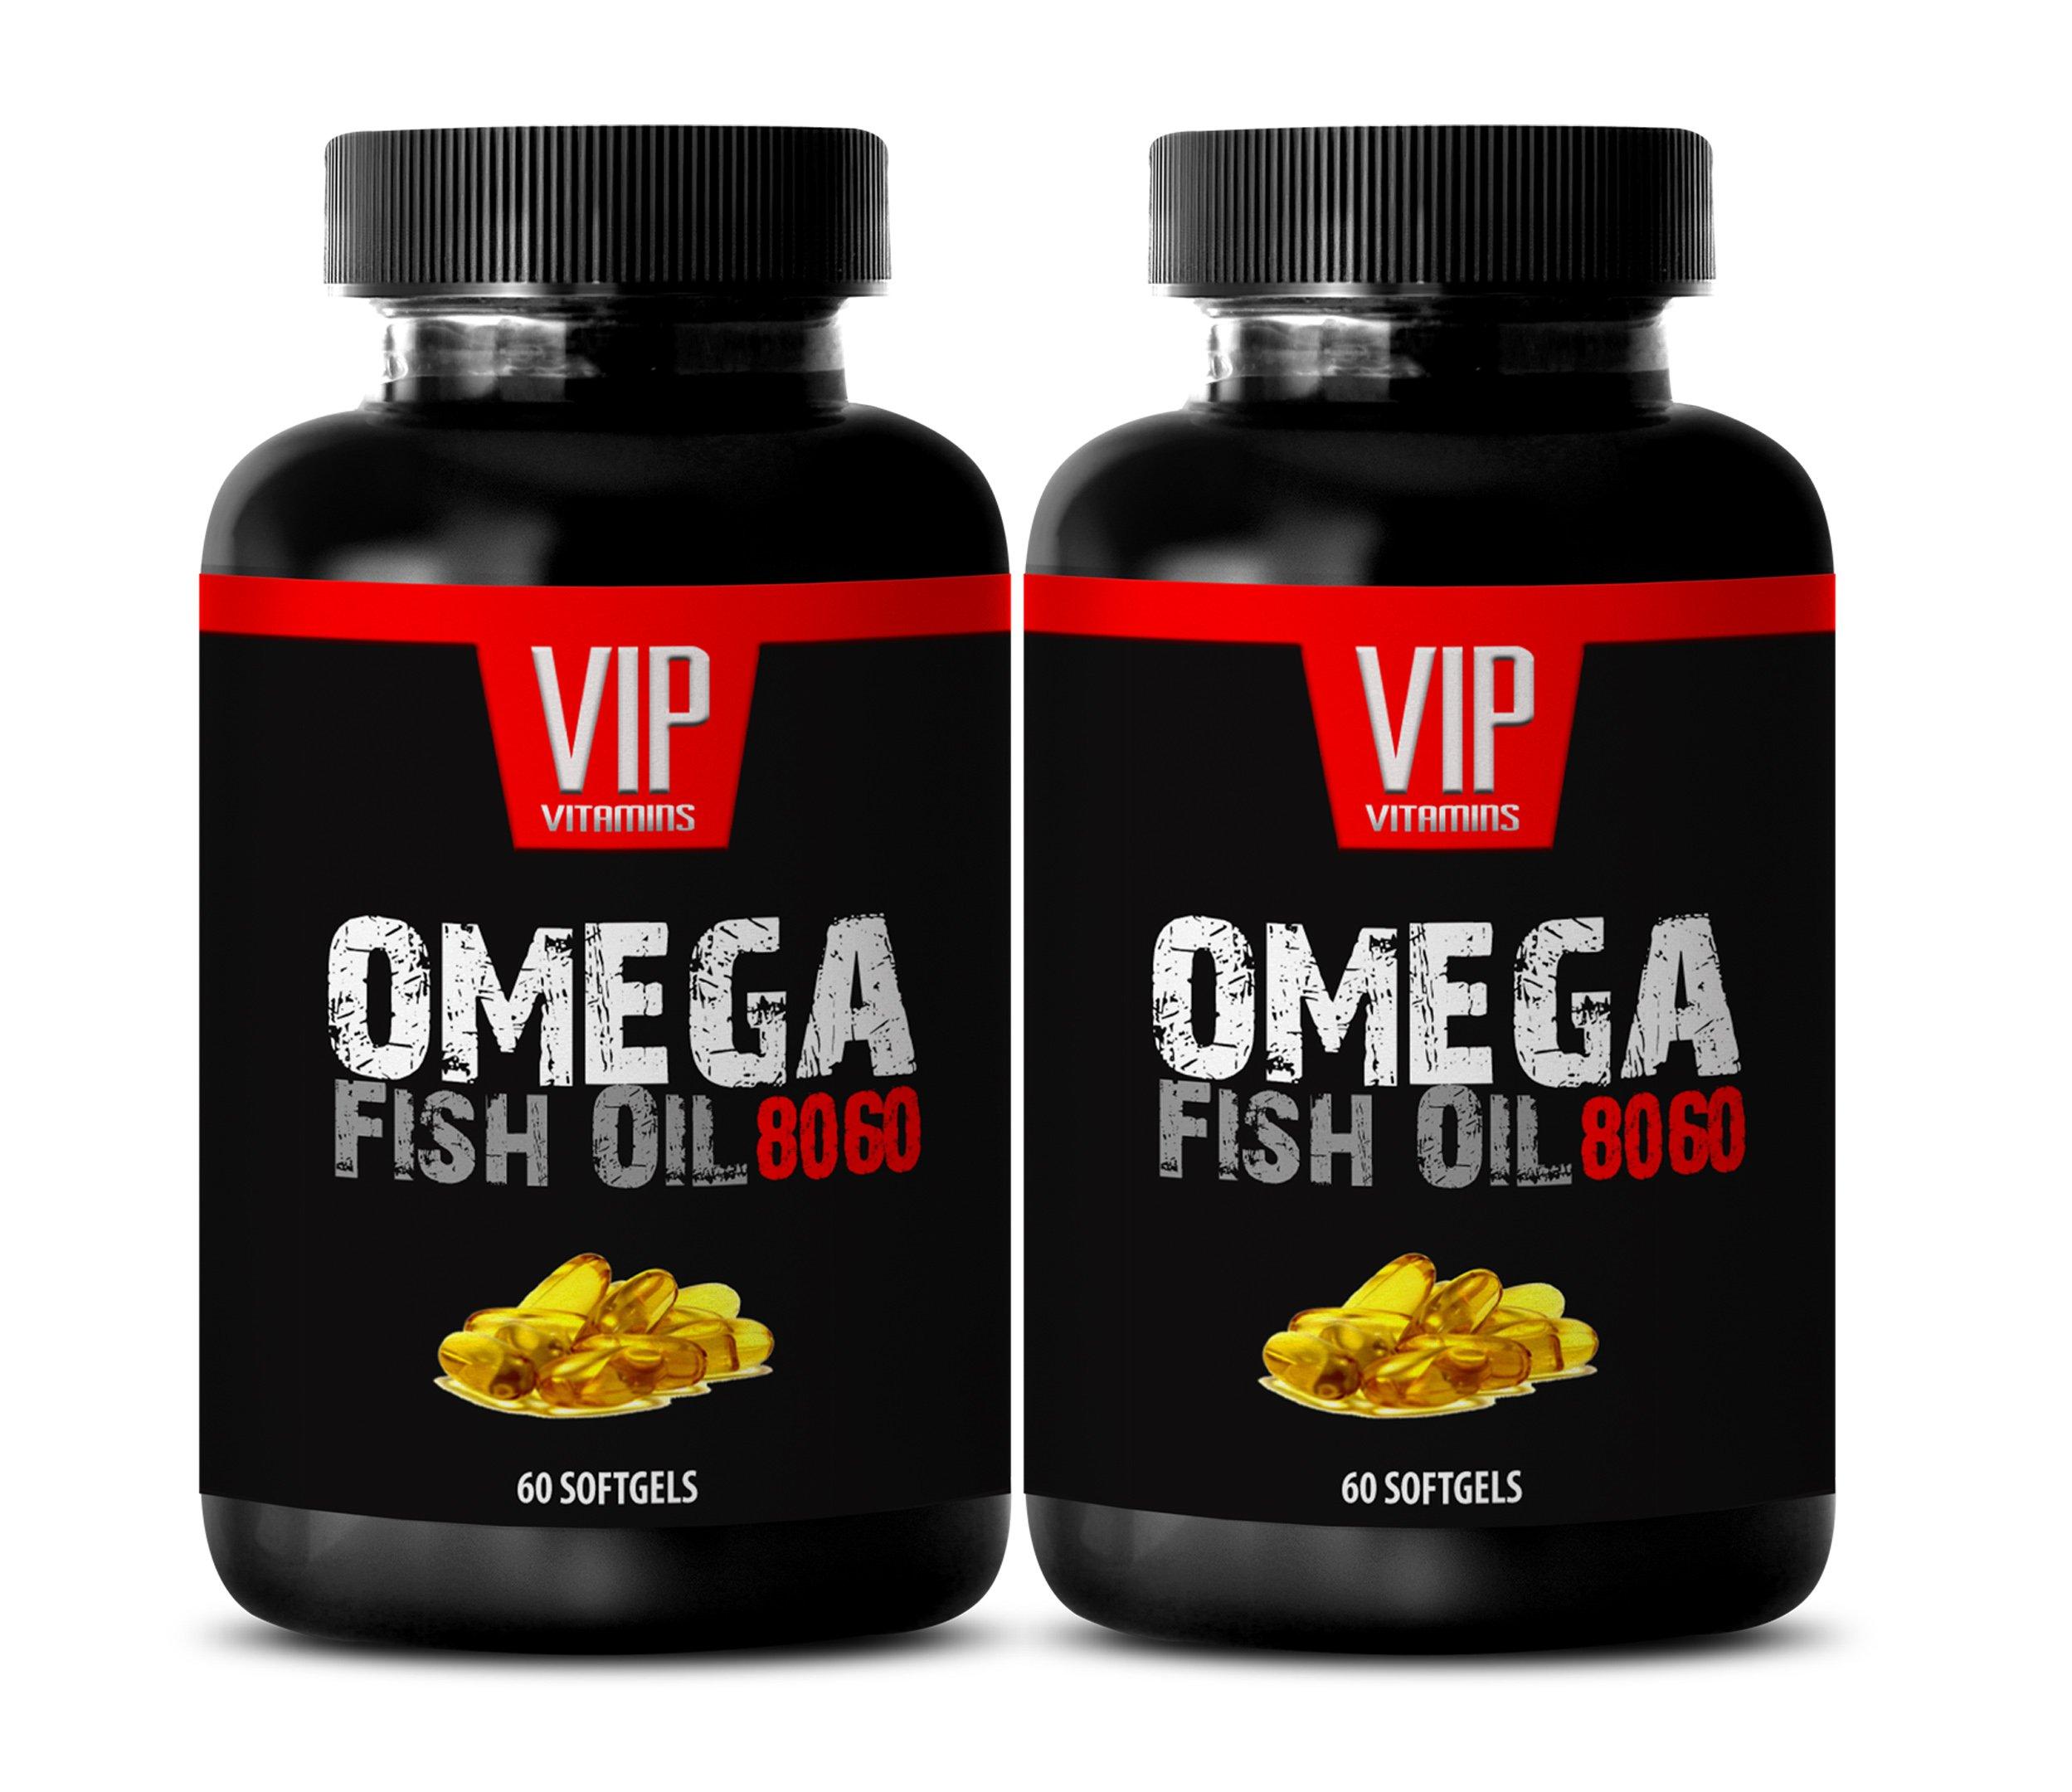 Brain supplements for adults - OMEGA FISH OIL 8060 - Omega 3 6 9 for women - 2 Bottles 120 Softgels